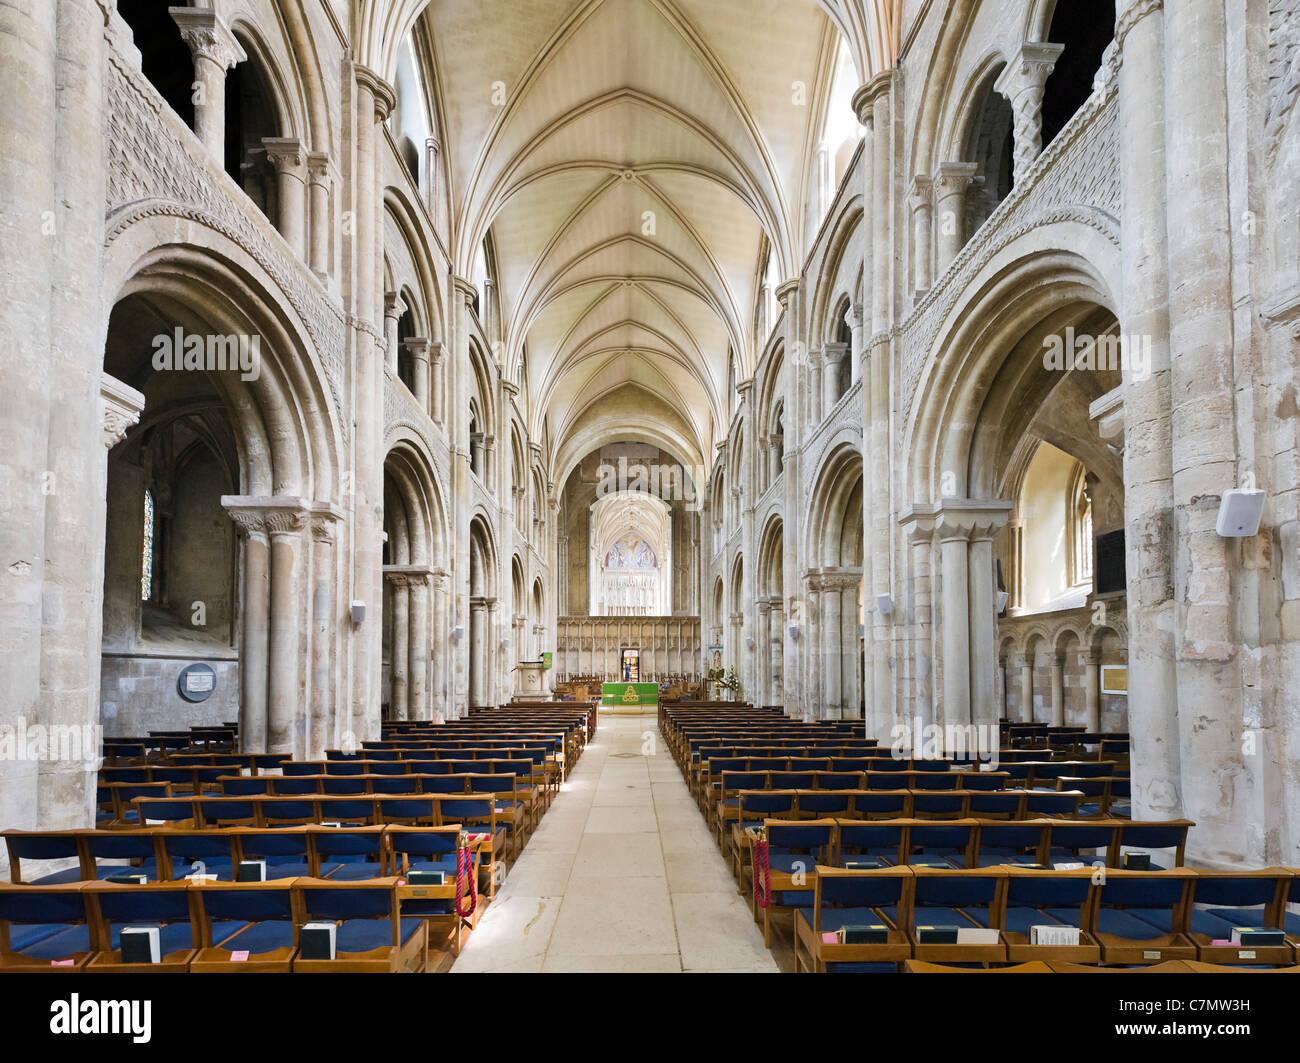 Nave of Christchurch Priory, Christchurch, Dorset, England, UK - Stock Image